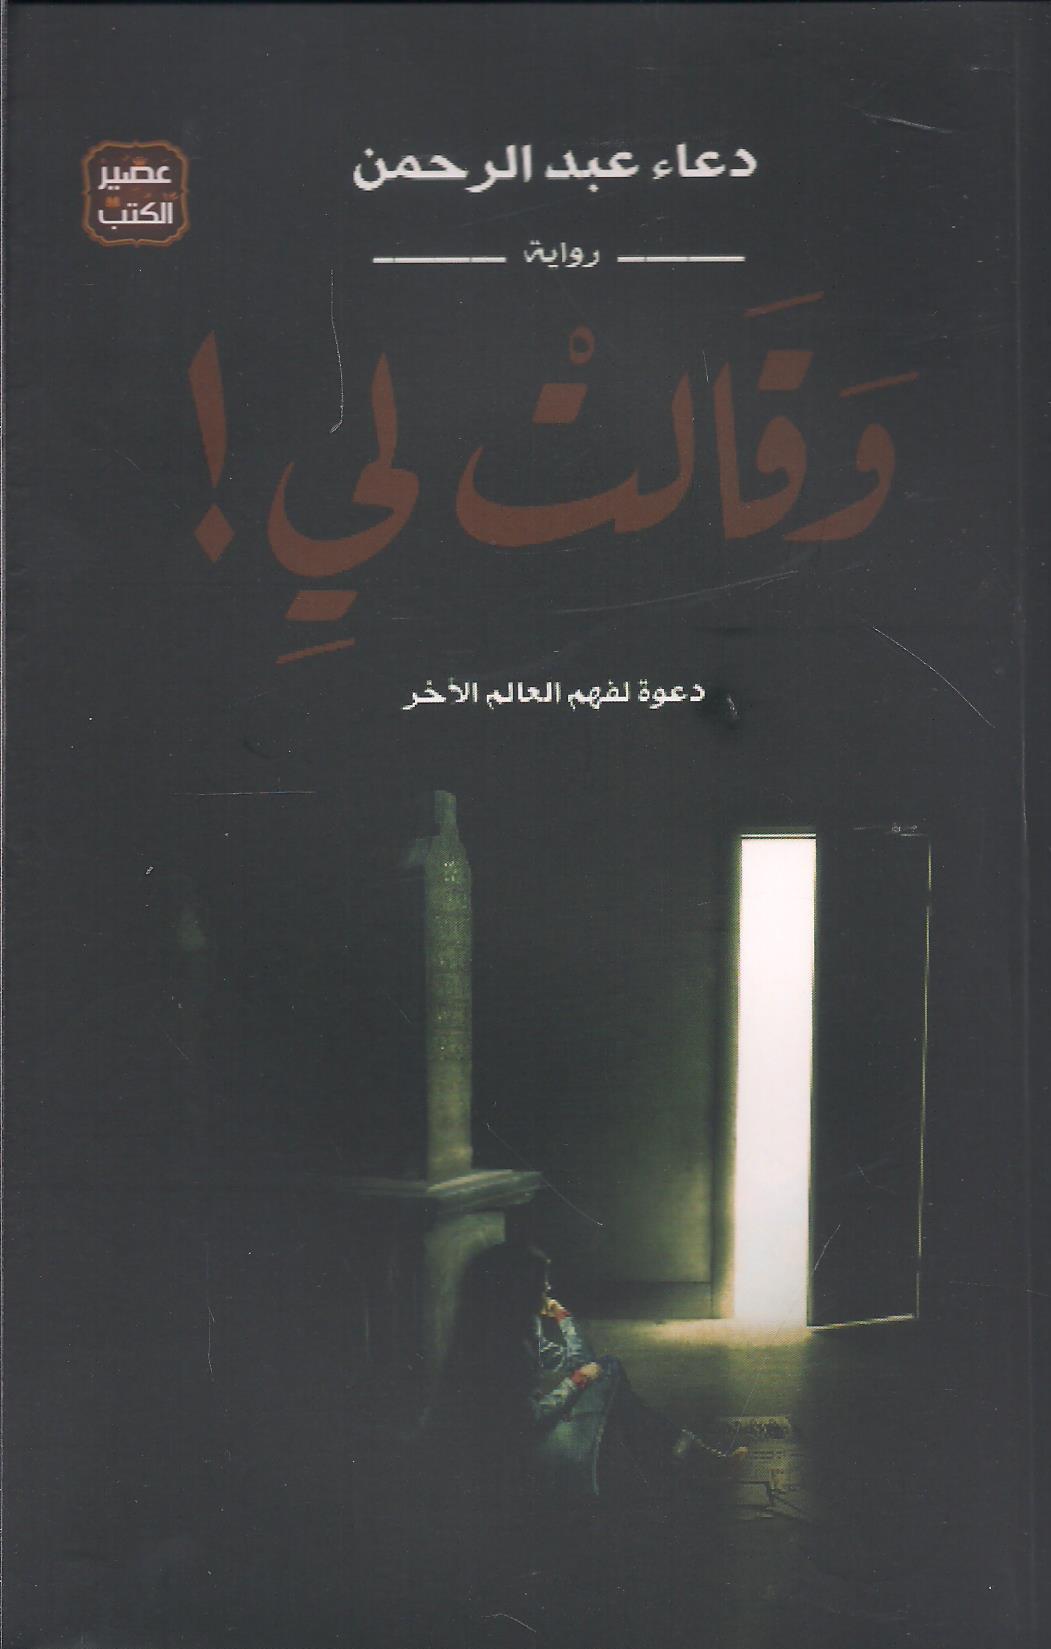 بالصور روايات دعاء عبد الرحمن , اجمل كتب دعاء عبد الرحمن 5492 2